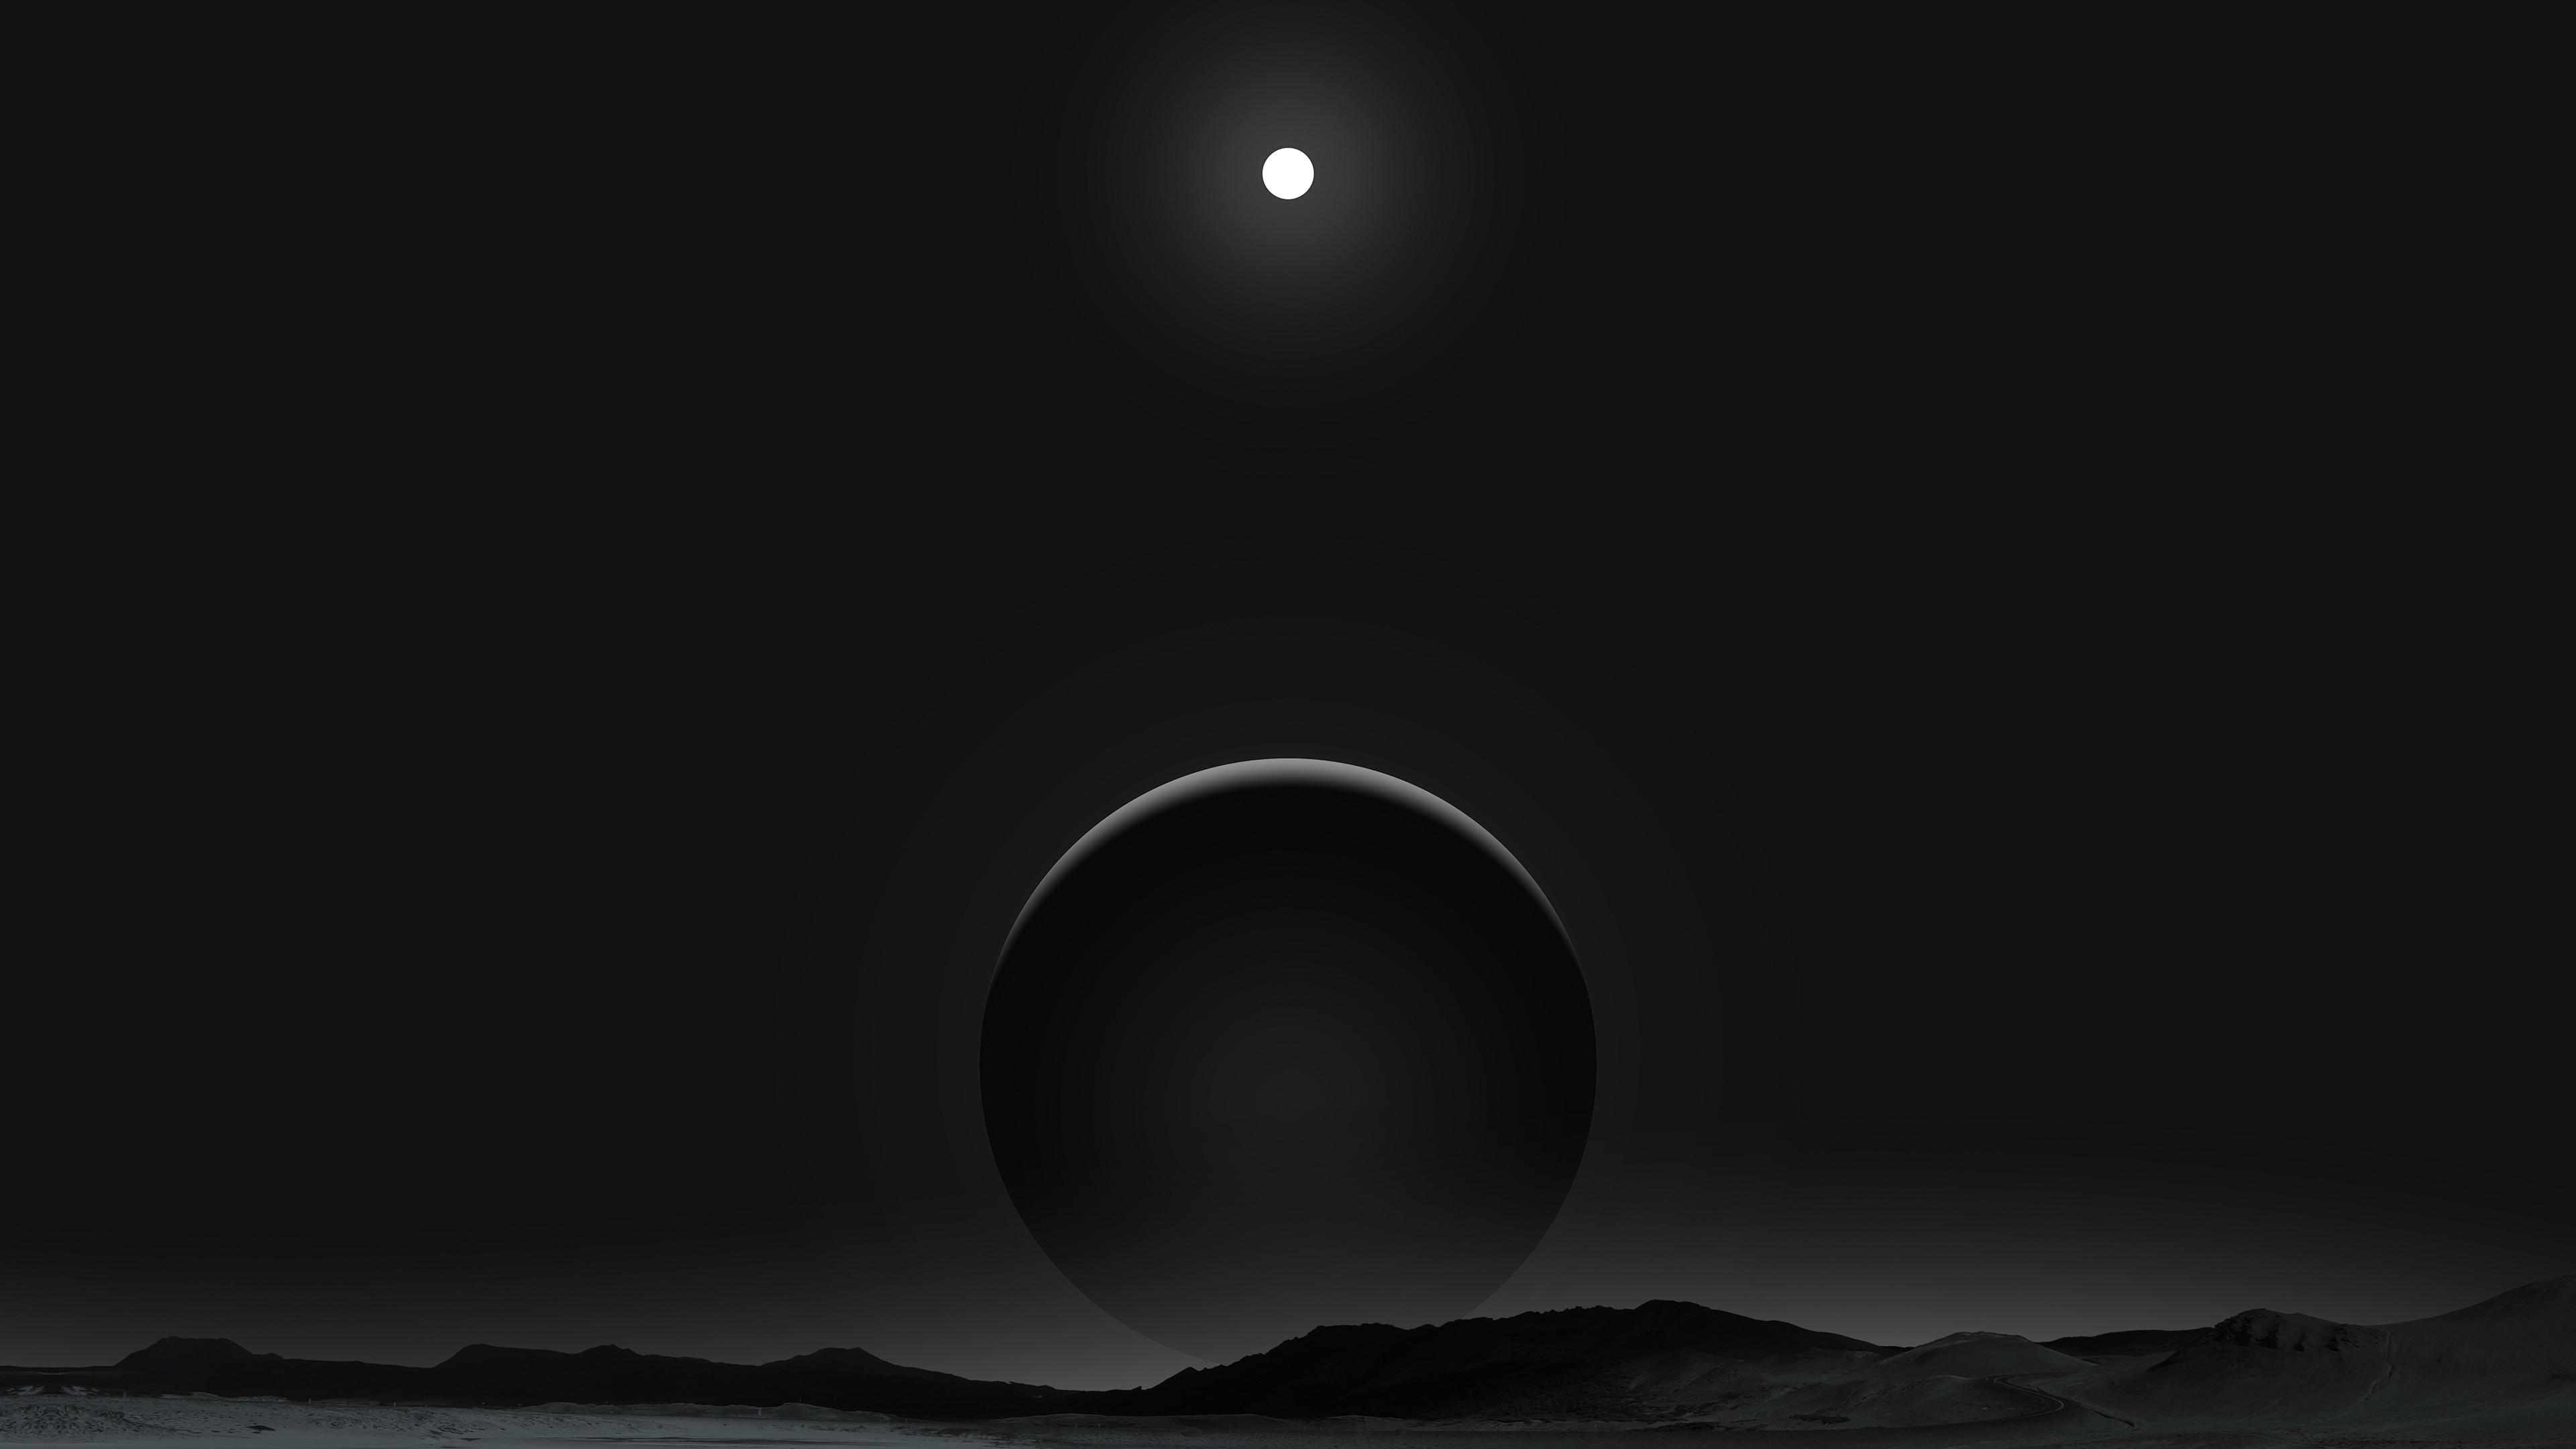 Papel De Parede Monocromático Noite Planeta Lua Luar